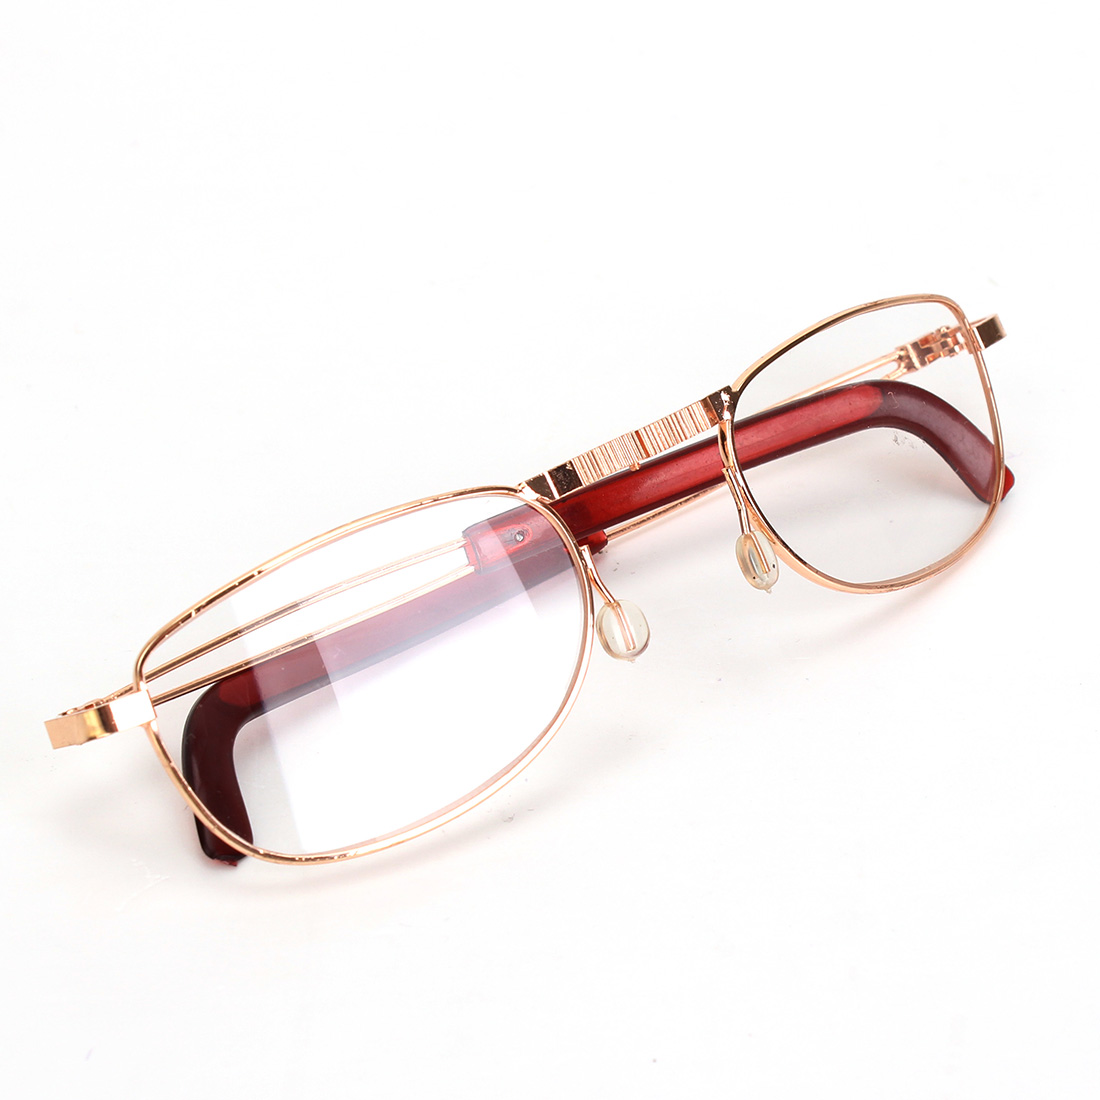 foldable compact rimmed reading glasses eyeglasses fold up